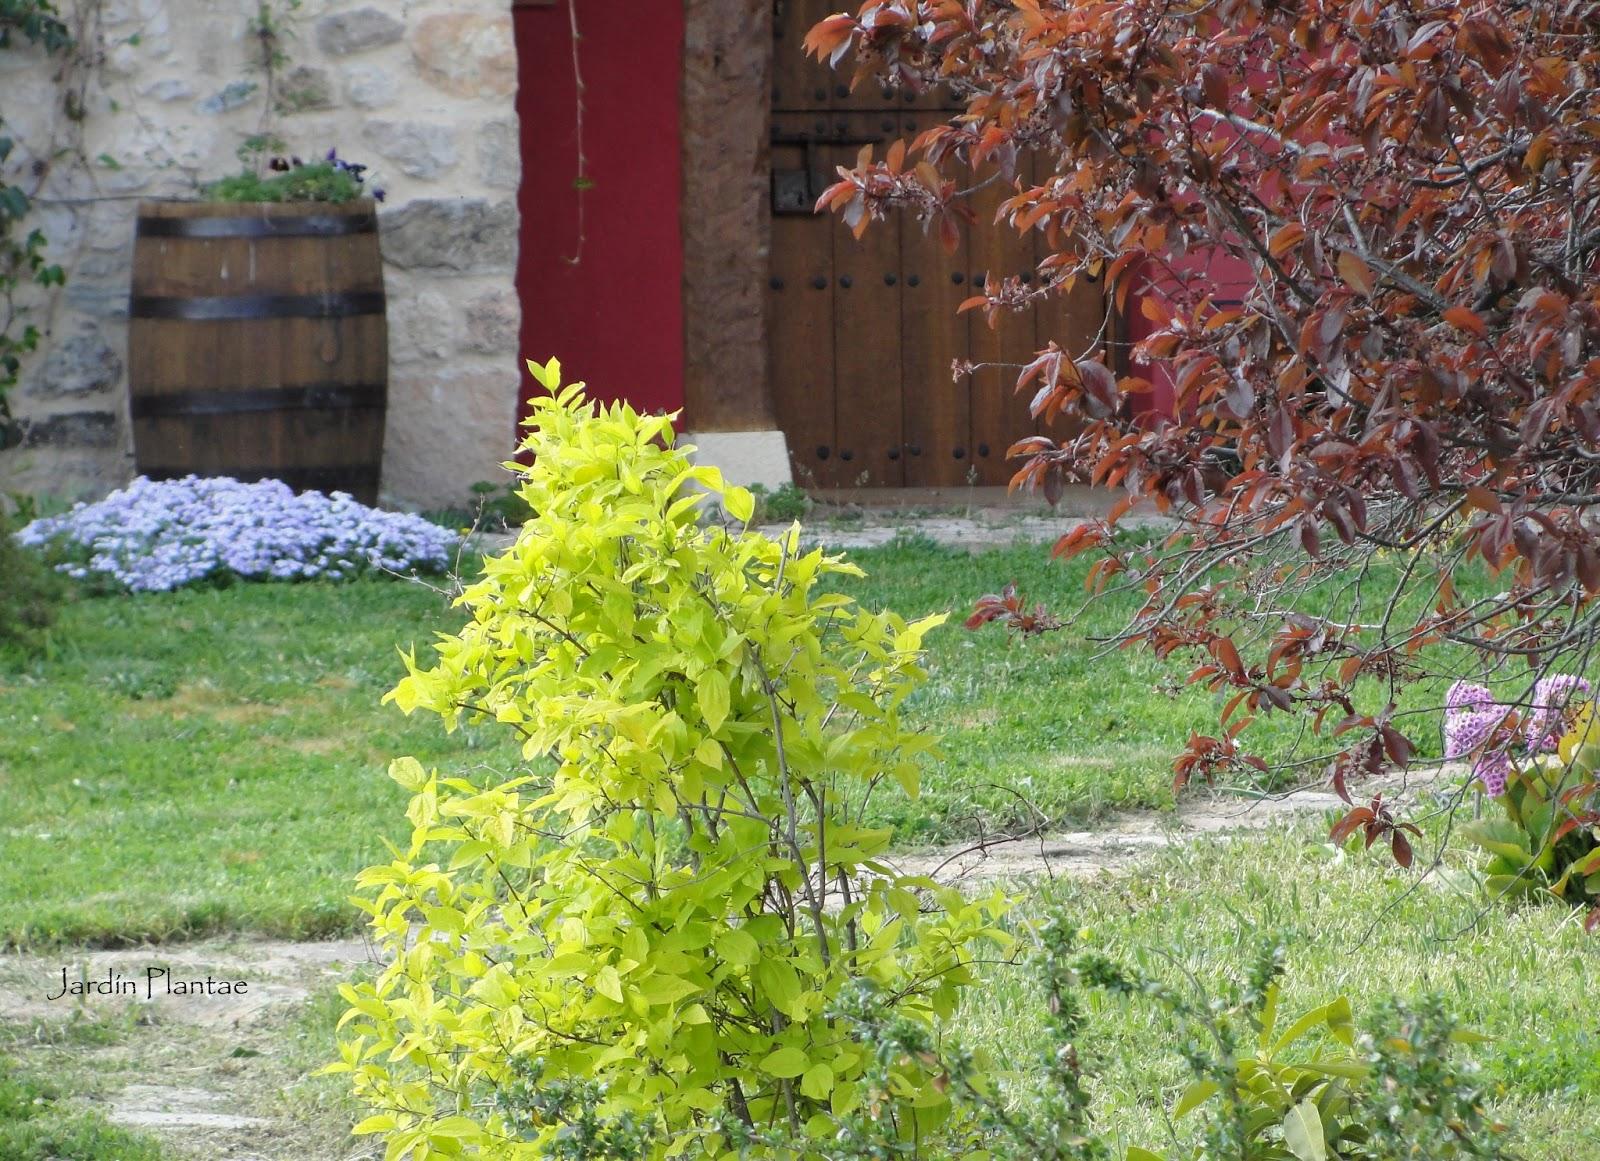 Jardiner a plantae un jard n en abril for Jardines de abril